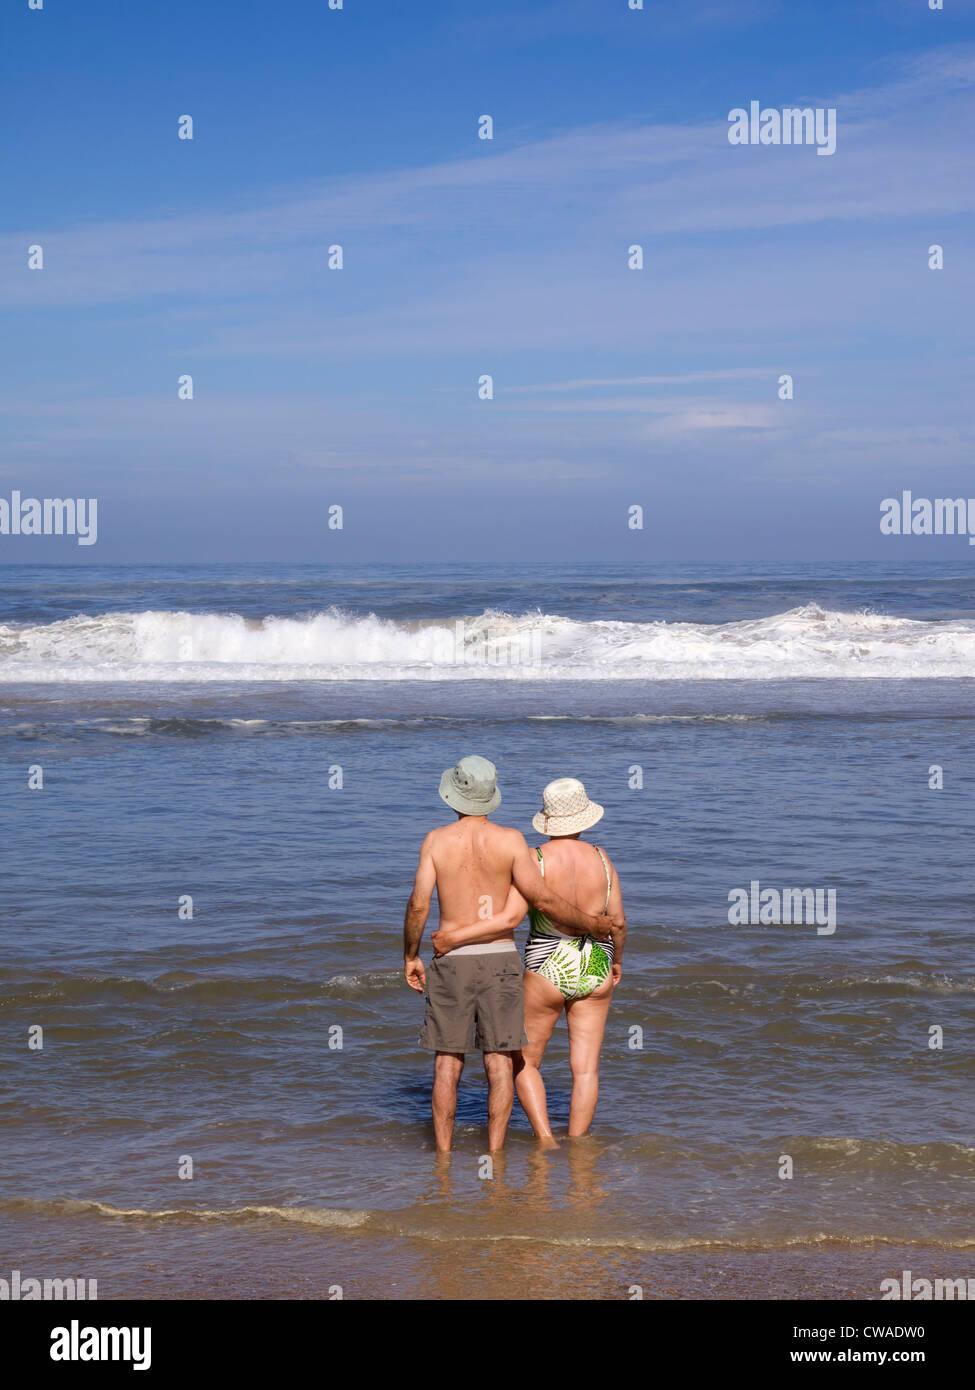 Senior couple on beach Photo Stock